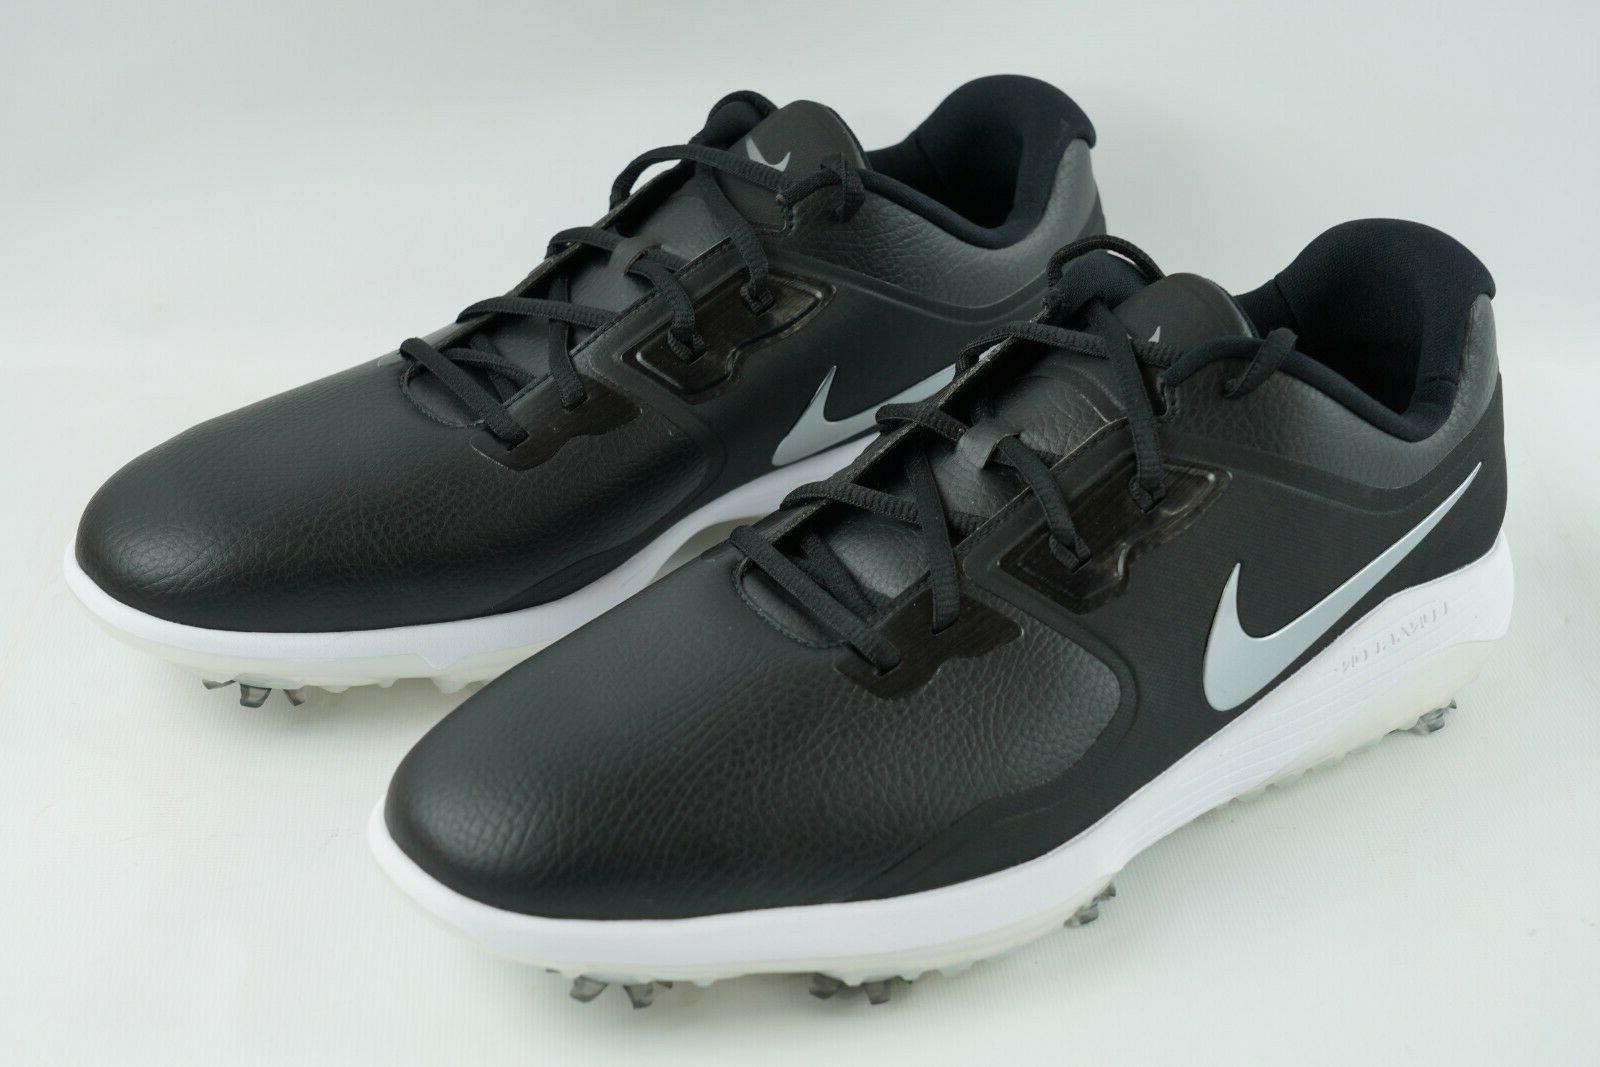 vapor pro golf shoes waterproof black white